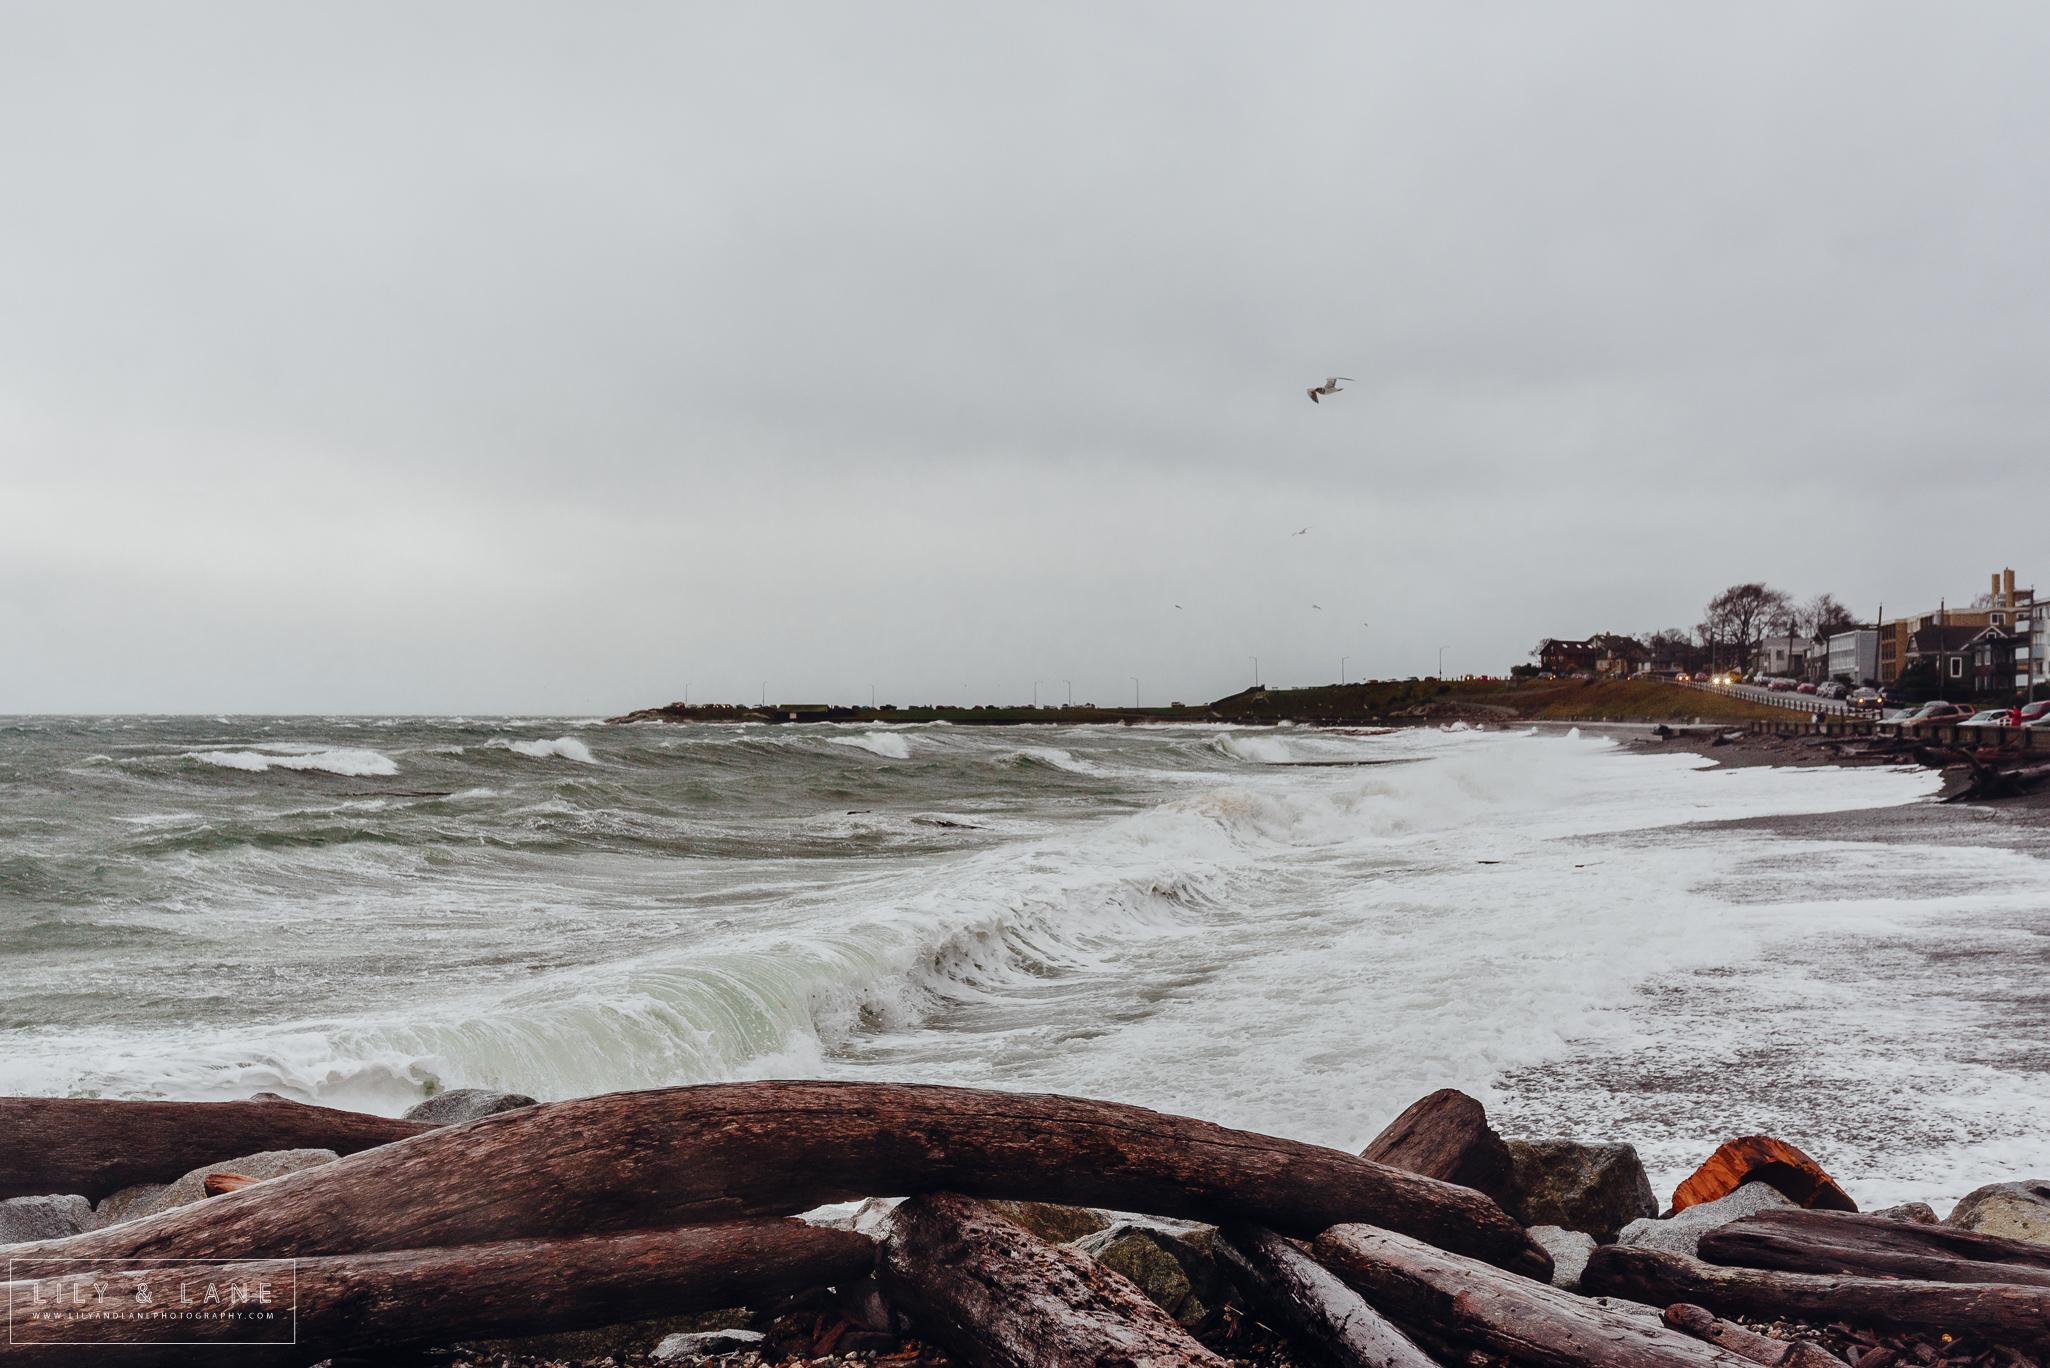 Nicola_Reiersen_Photography_Victoria_BC_Winter_Storm.jpg